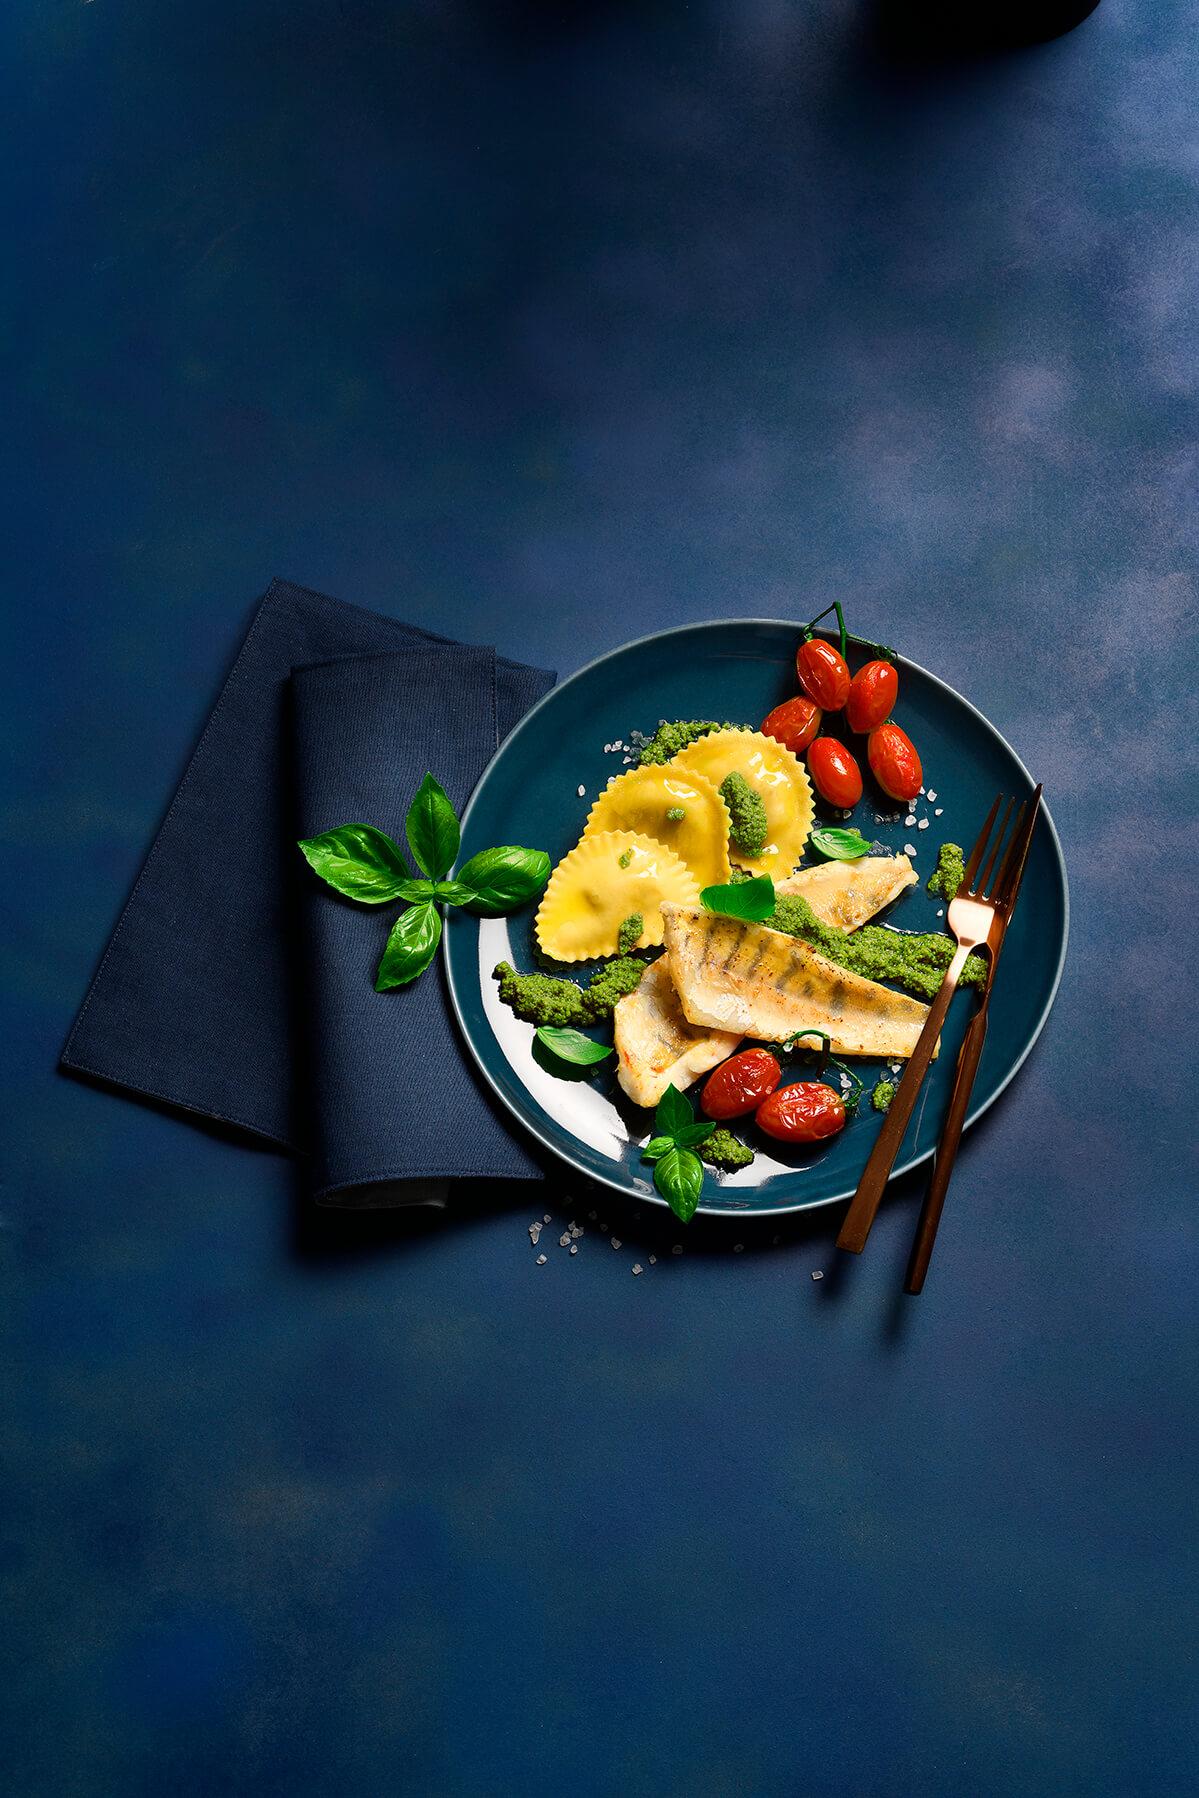 Zanderfilet von Antje Plewinski Foodfotografie